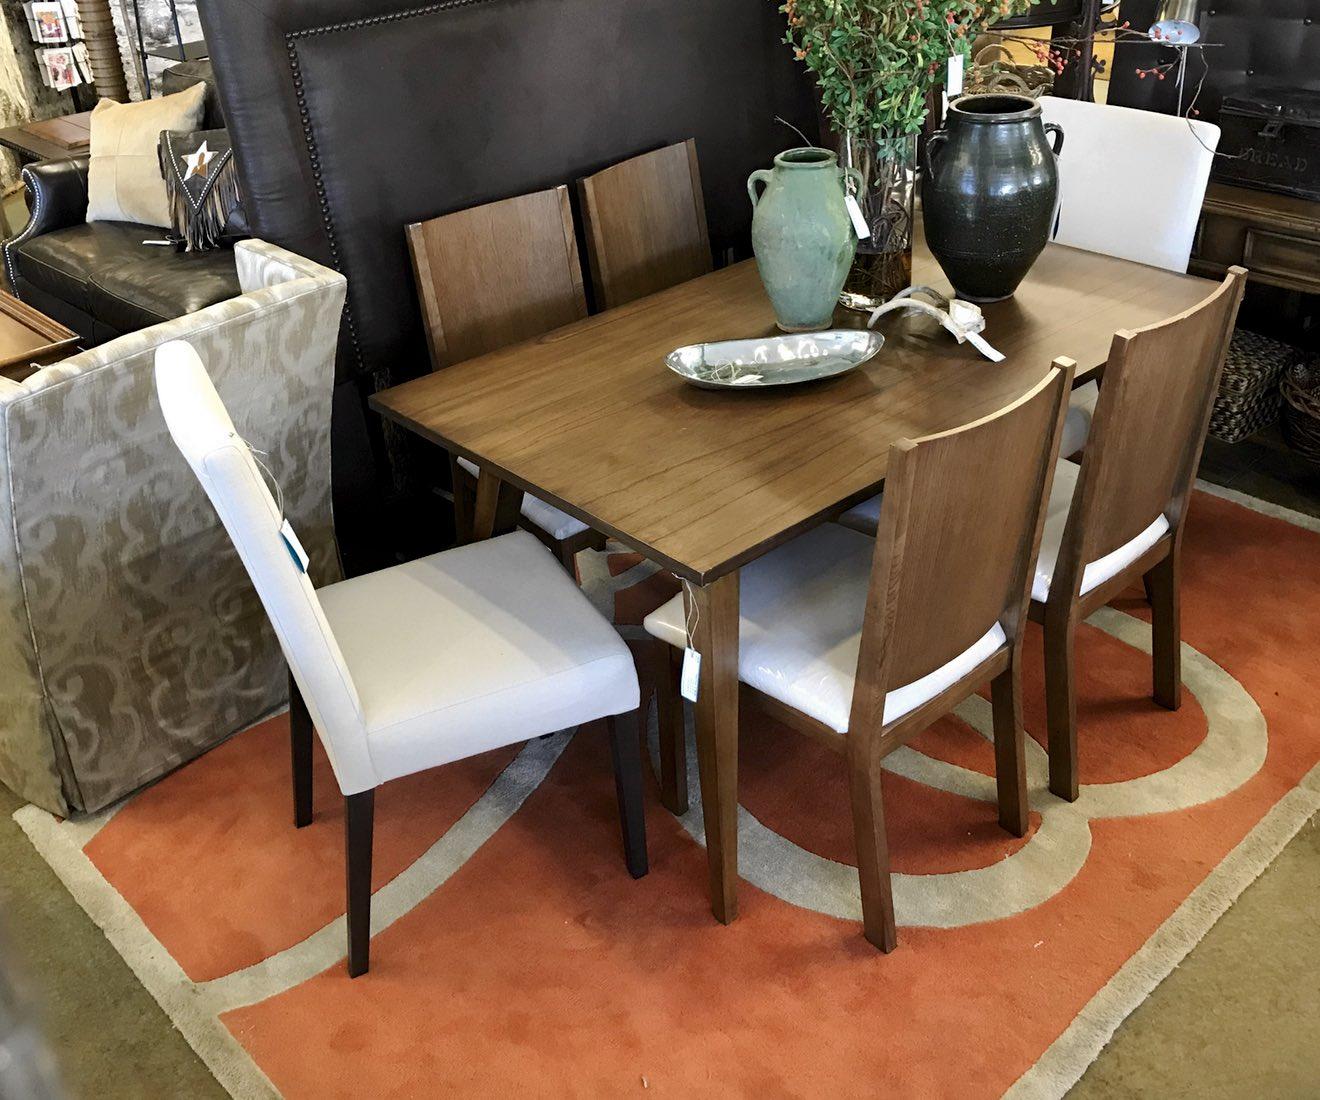 Consignment Furniture Avon & Vail